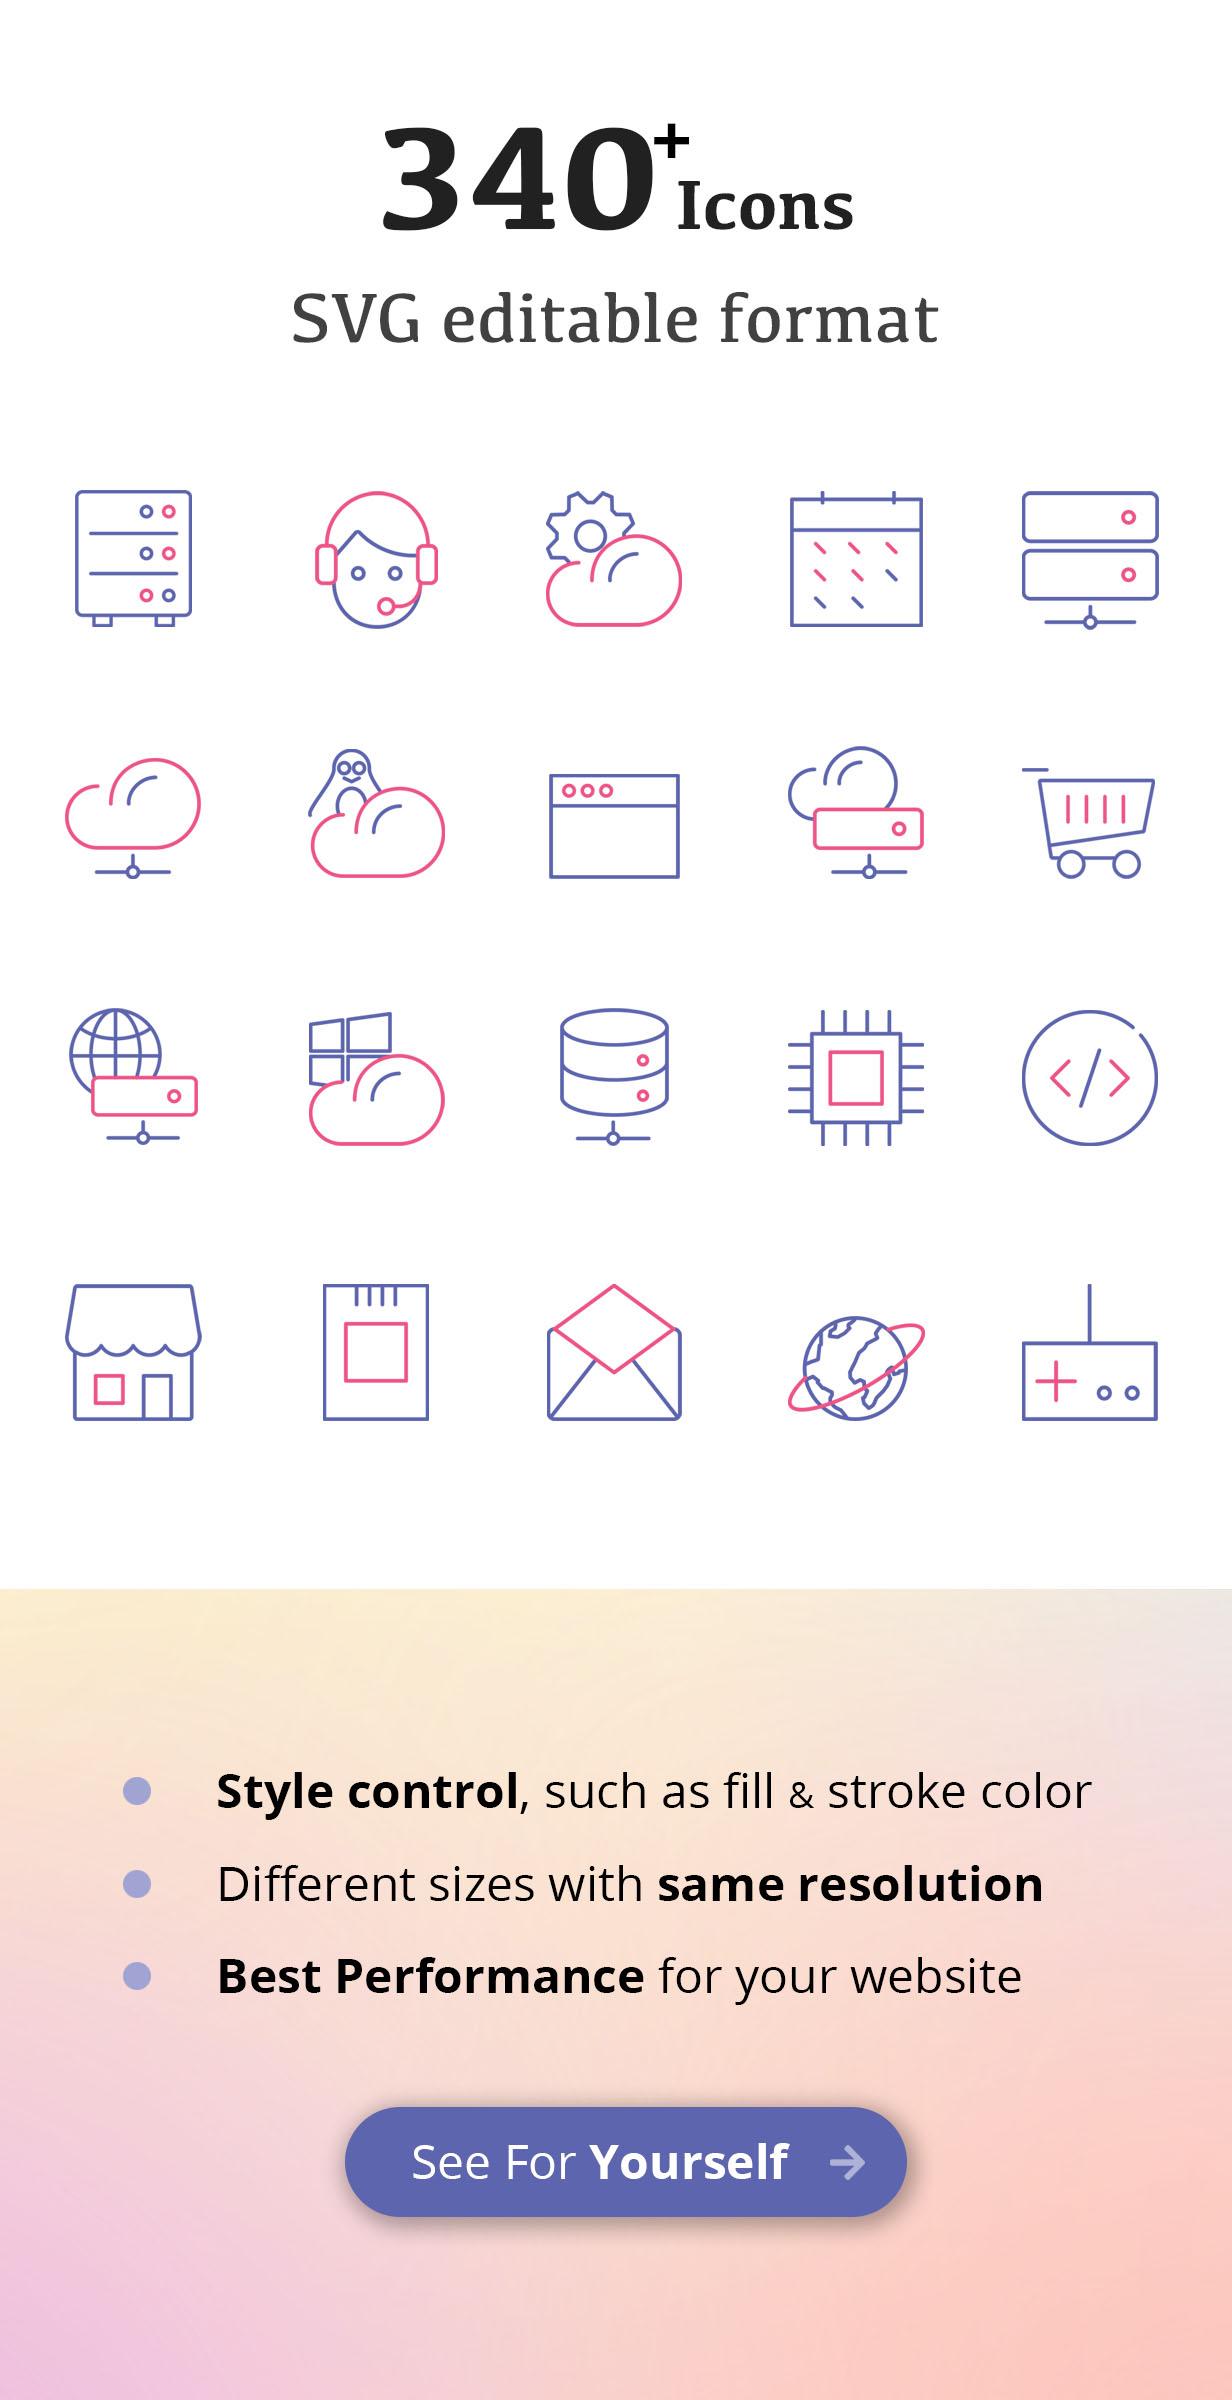 SVG Icons